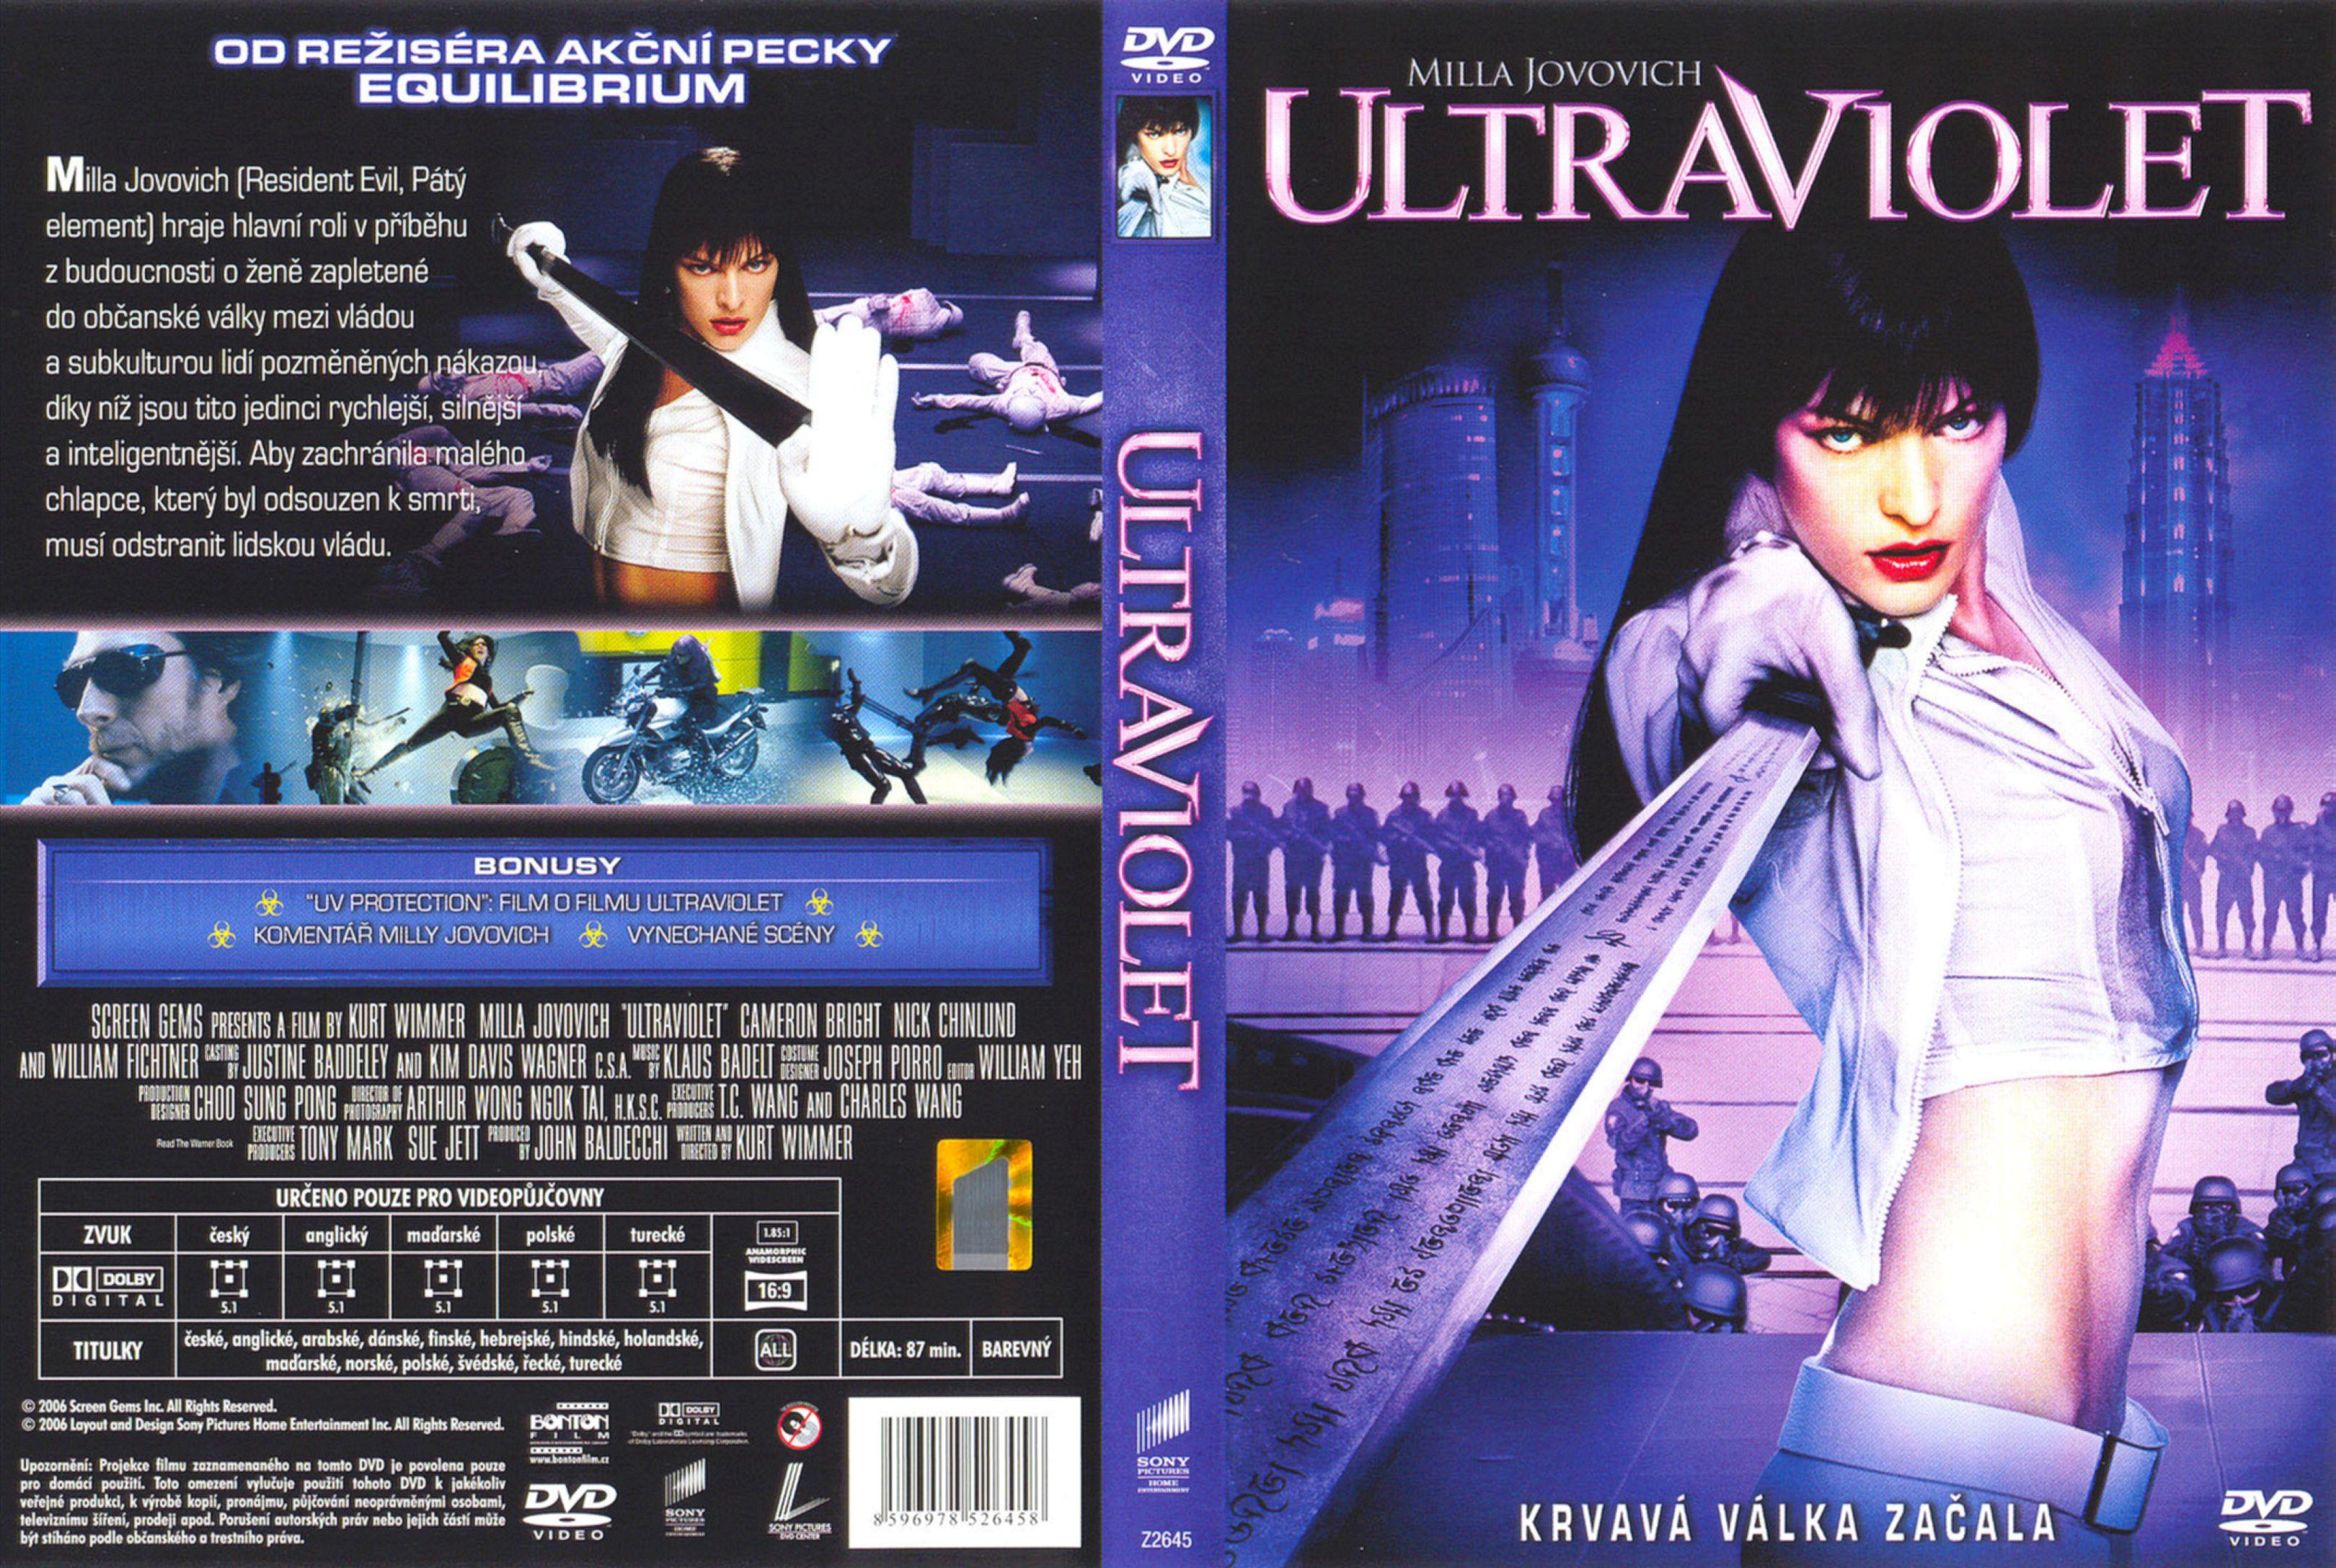 ultraviolet 2006 full movie download